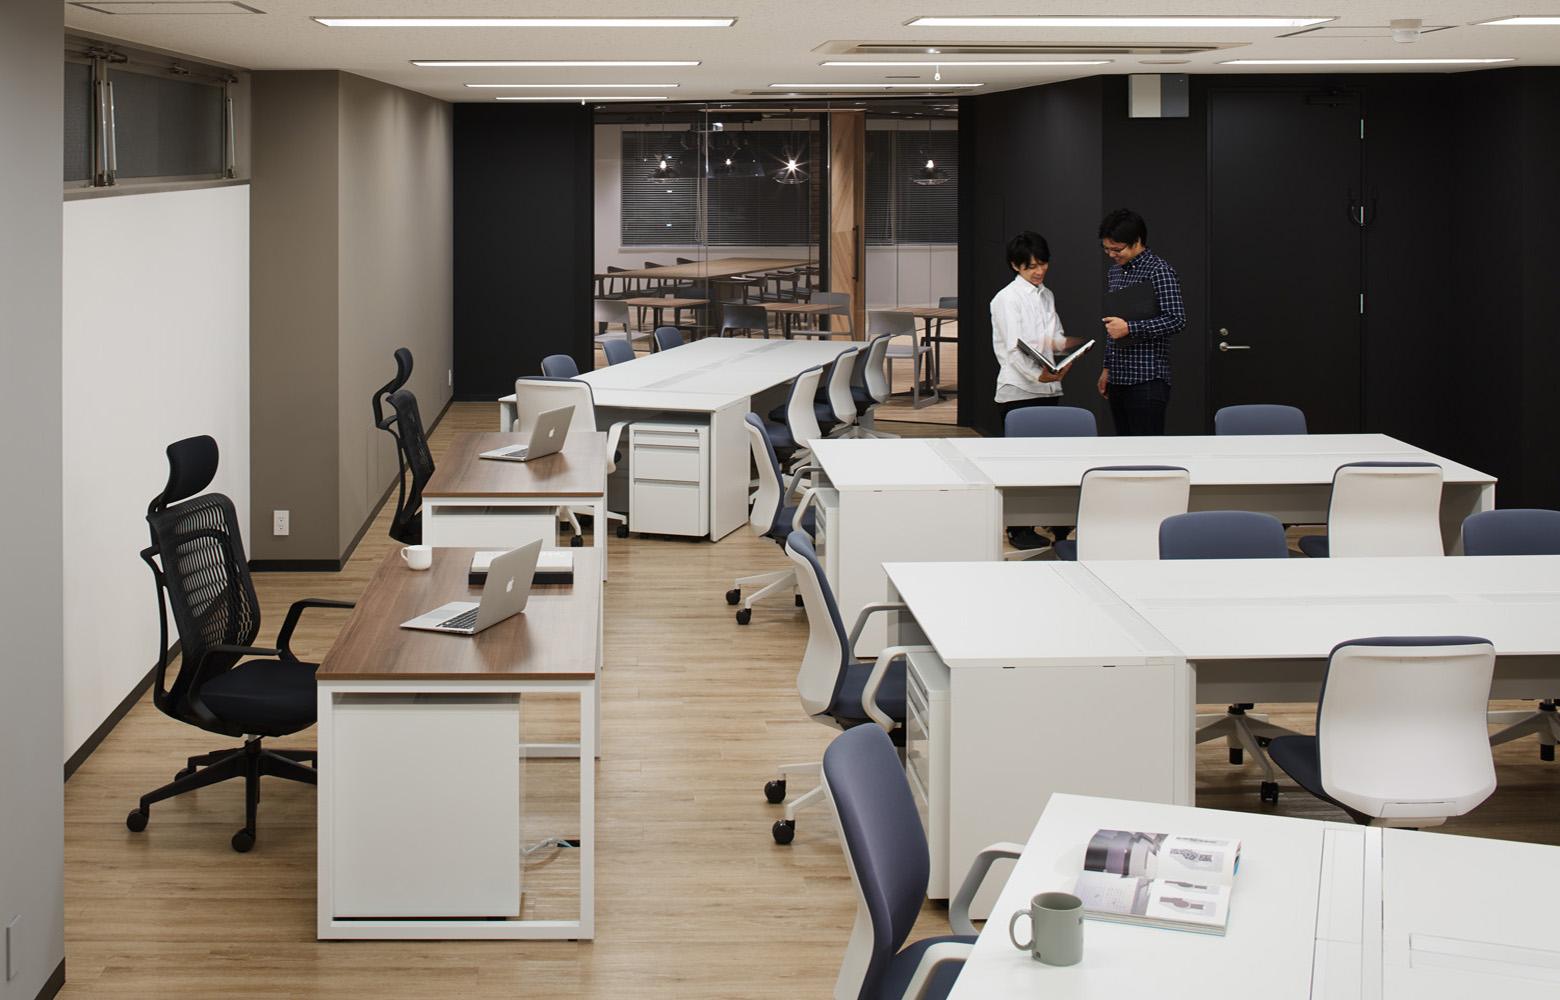 BEST株式会社 Work Space デザイン・レイアウト事例